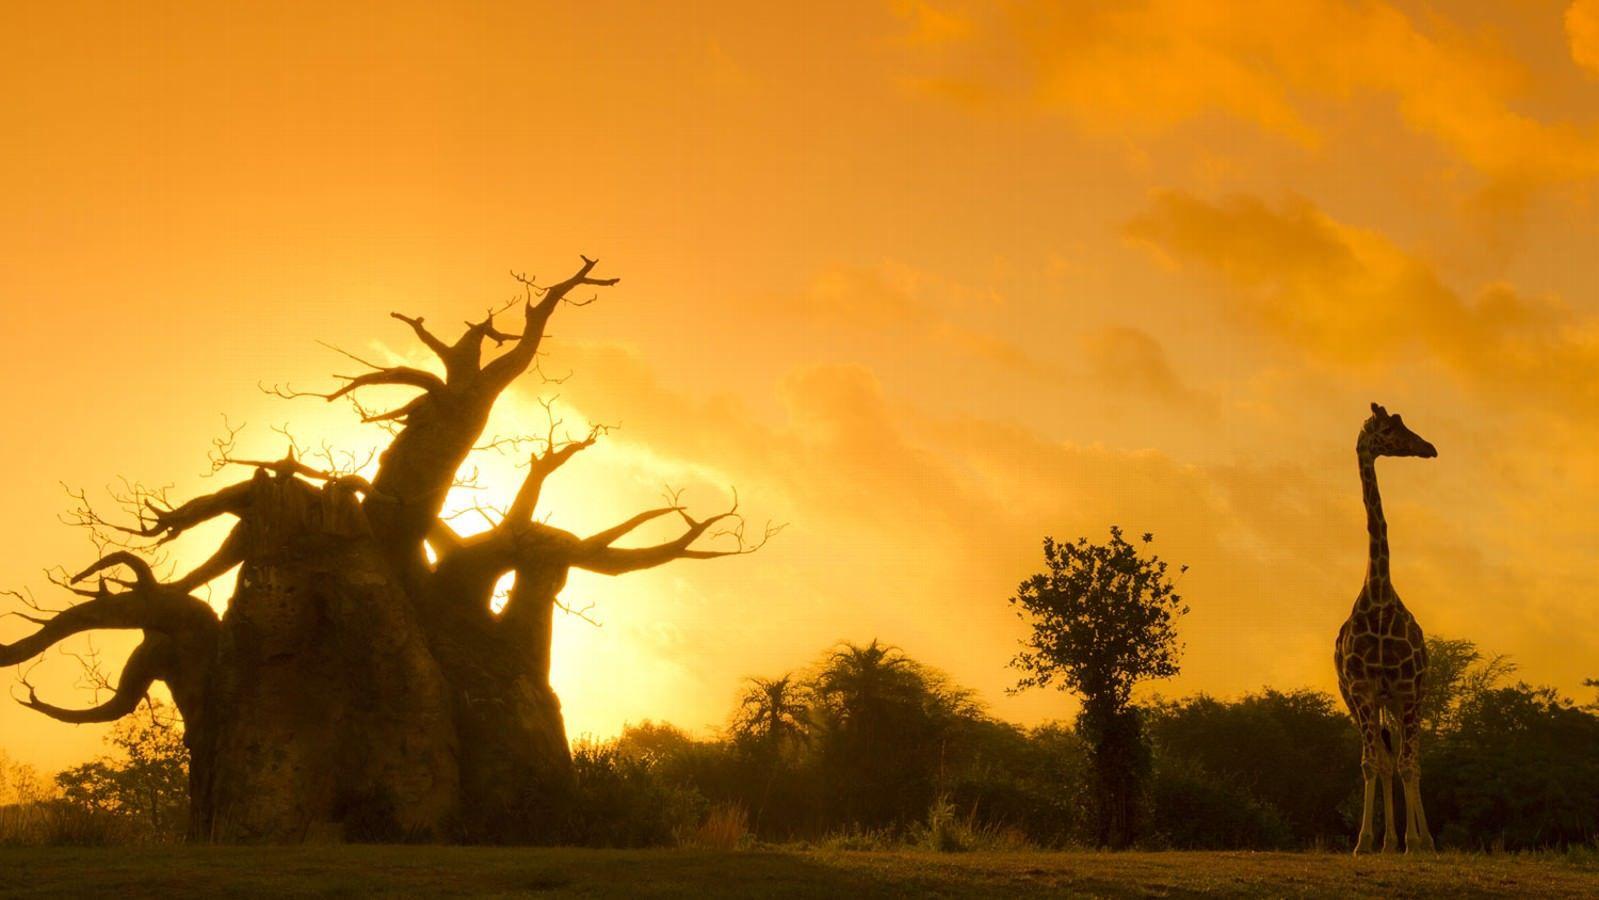 Kilimanjaro Safari Sunset Animal Kingdom